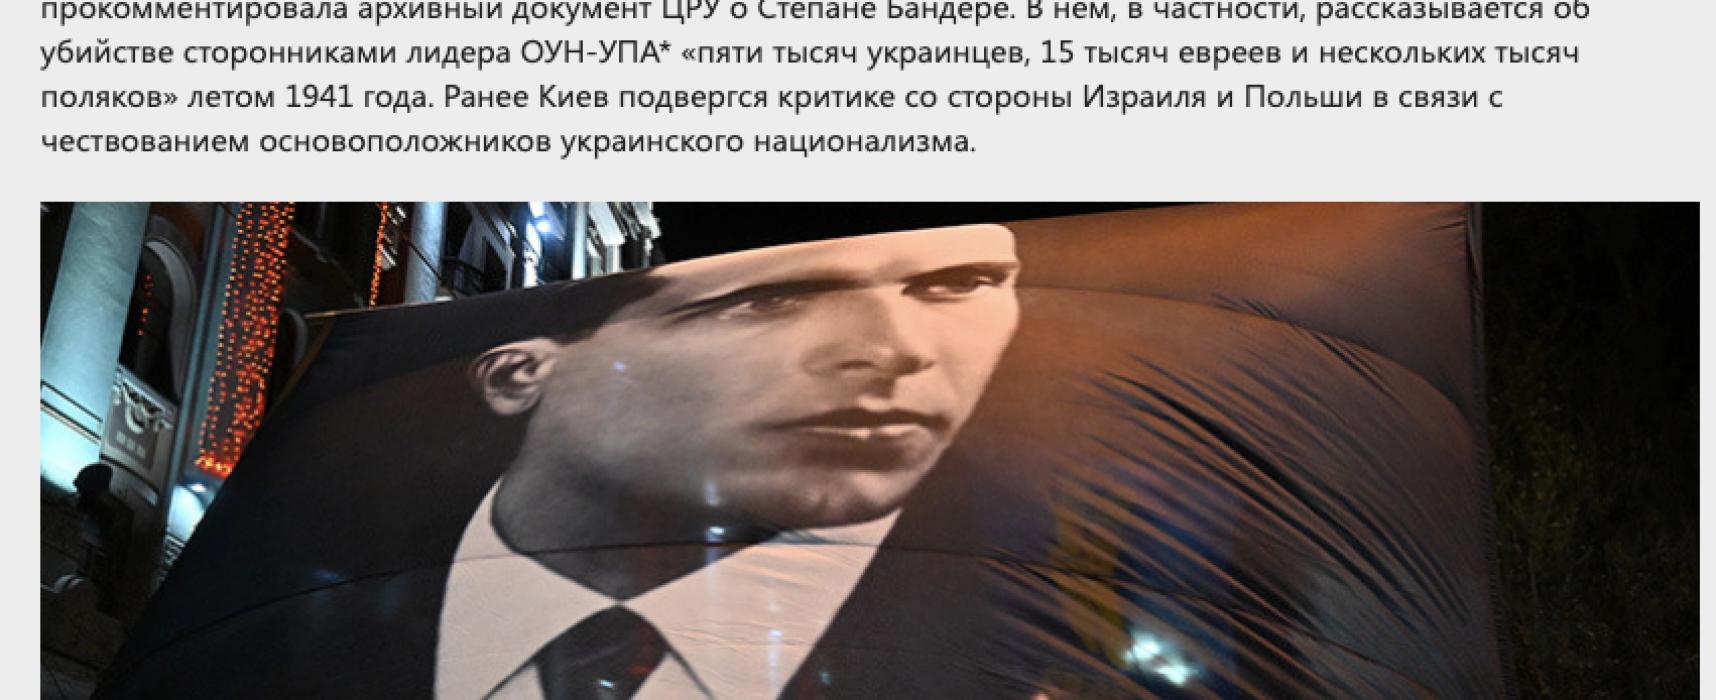 Fake: CIA-Archivdokument enthüllt Wahrheit über Bandera